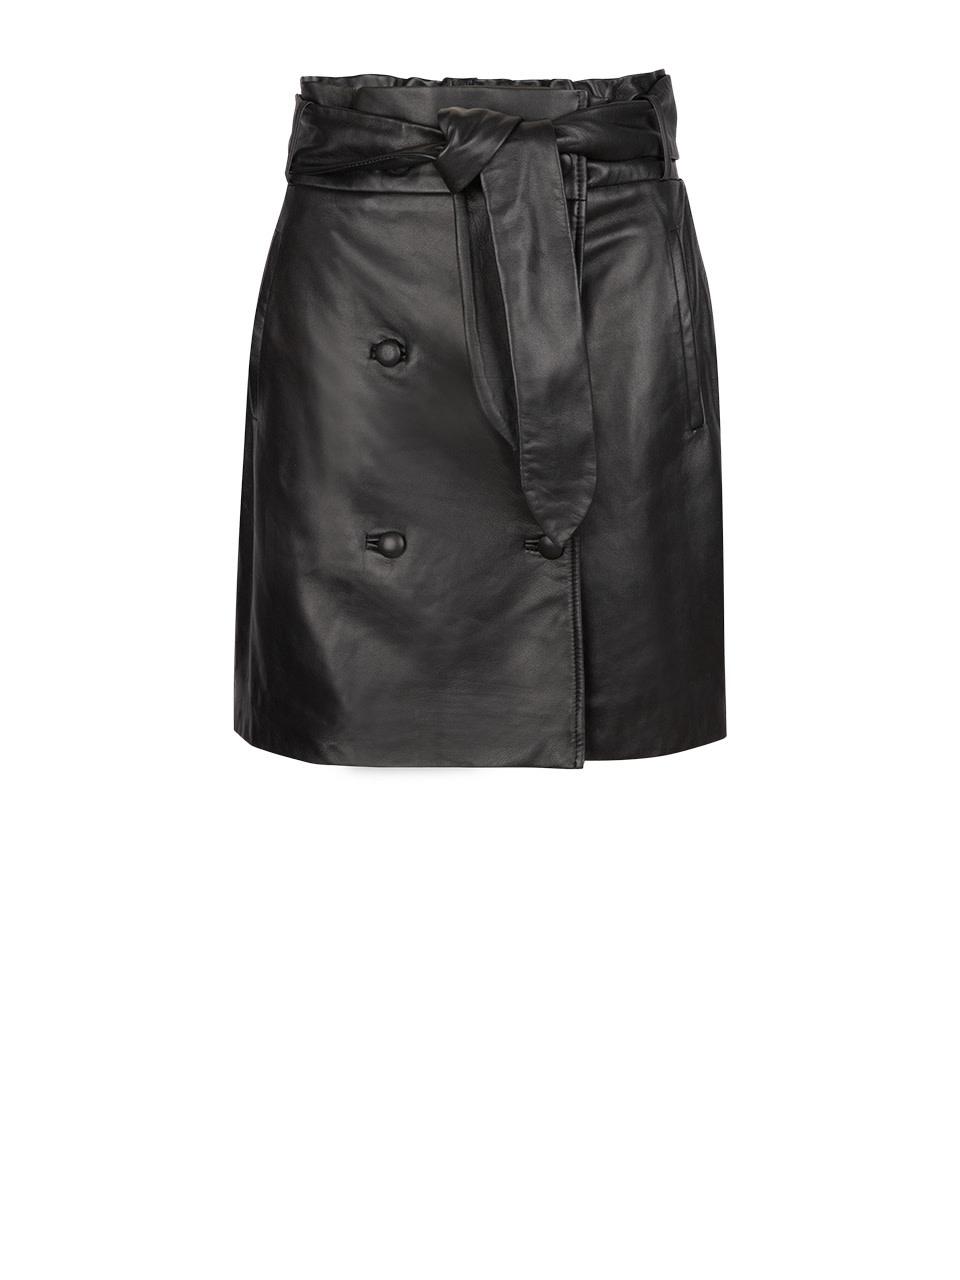 Kathy leather skirt-1